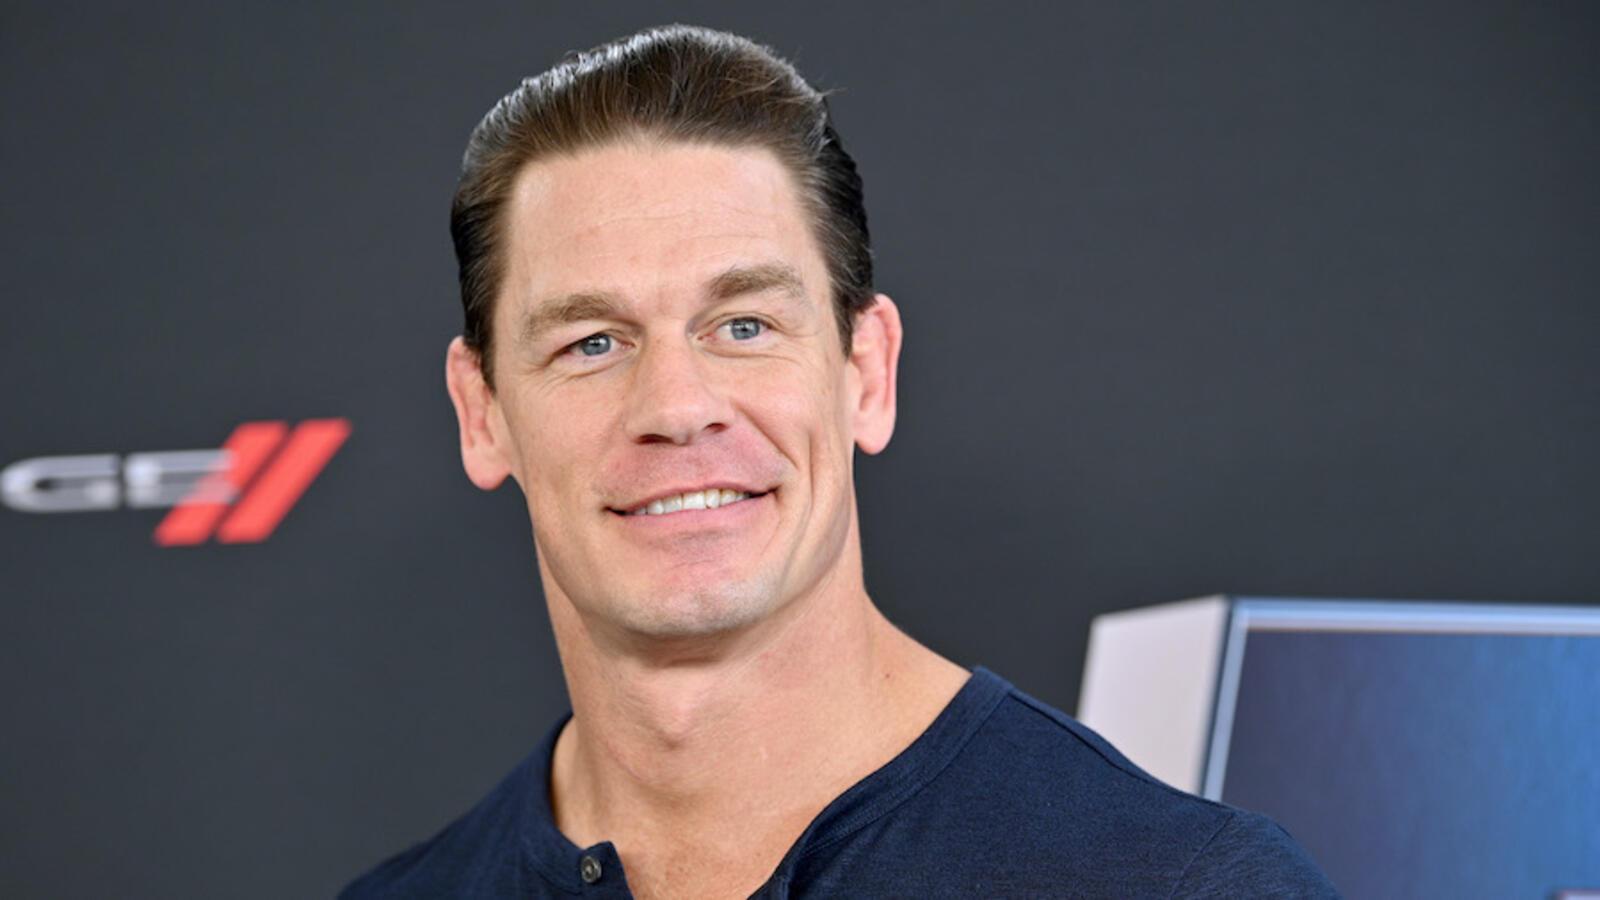 WATCH: John Cena Addresses Rumors Of WWE Return On Tonight Show